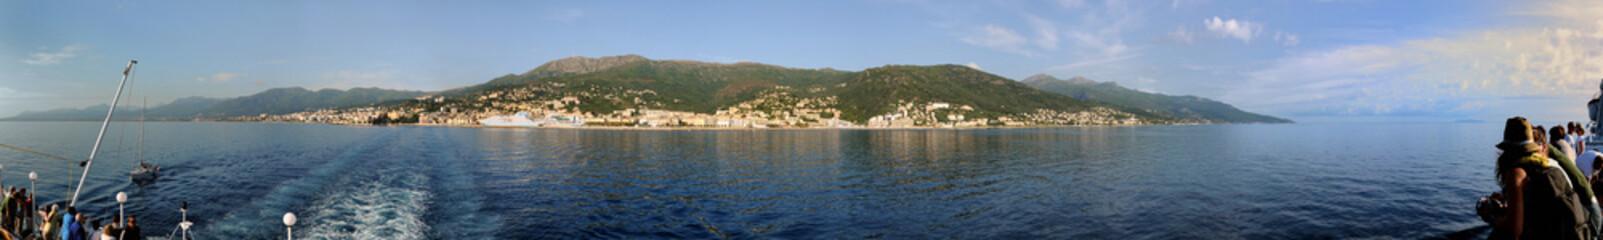 Korsyka panorama